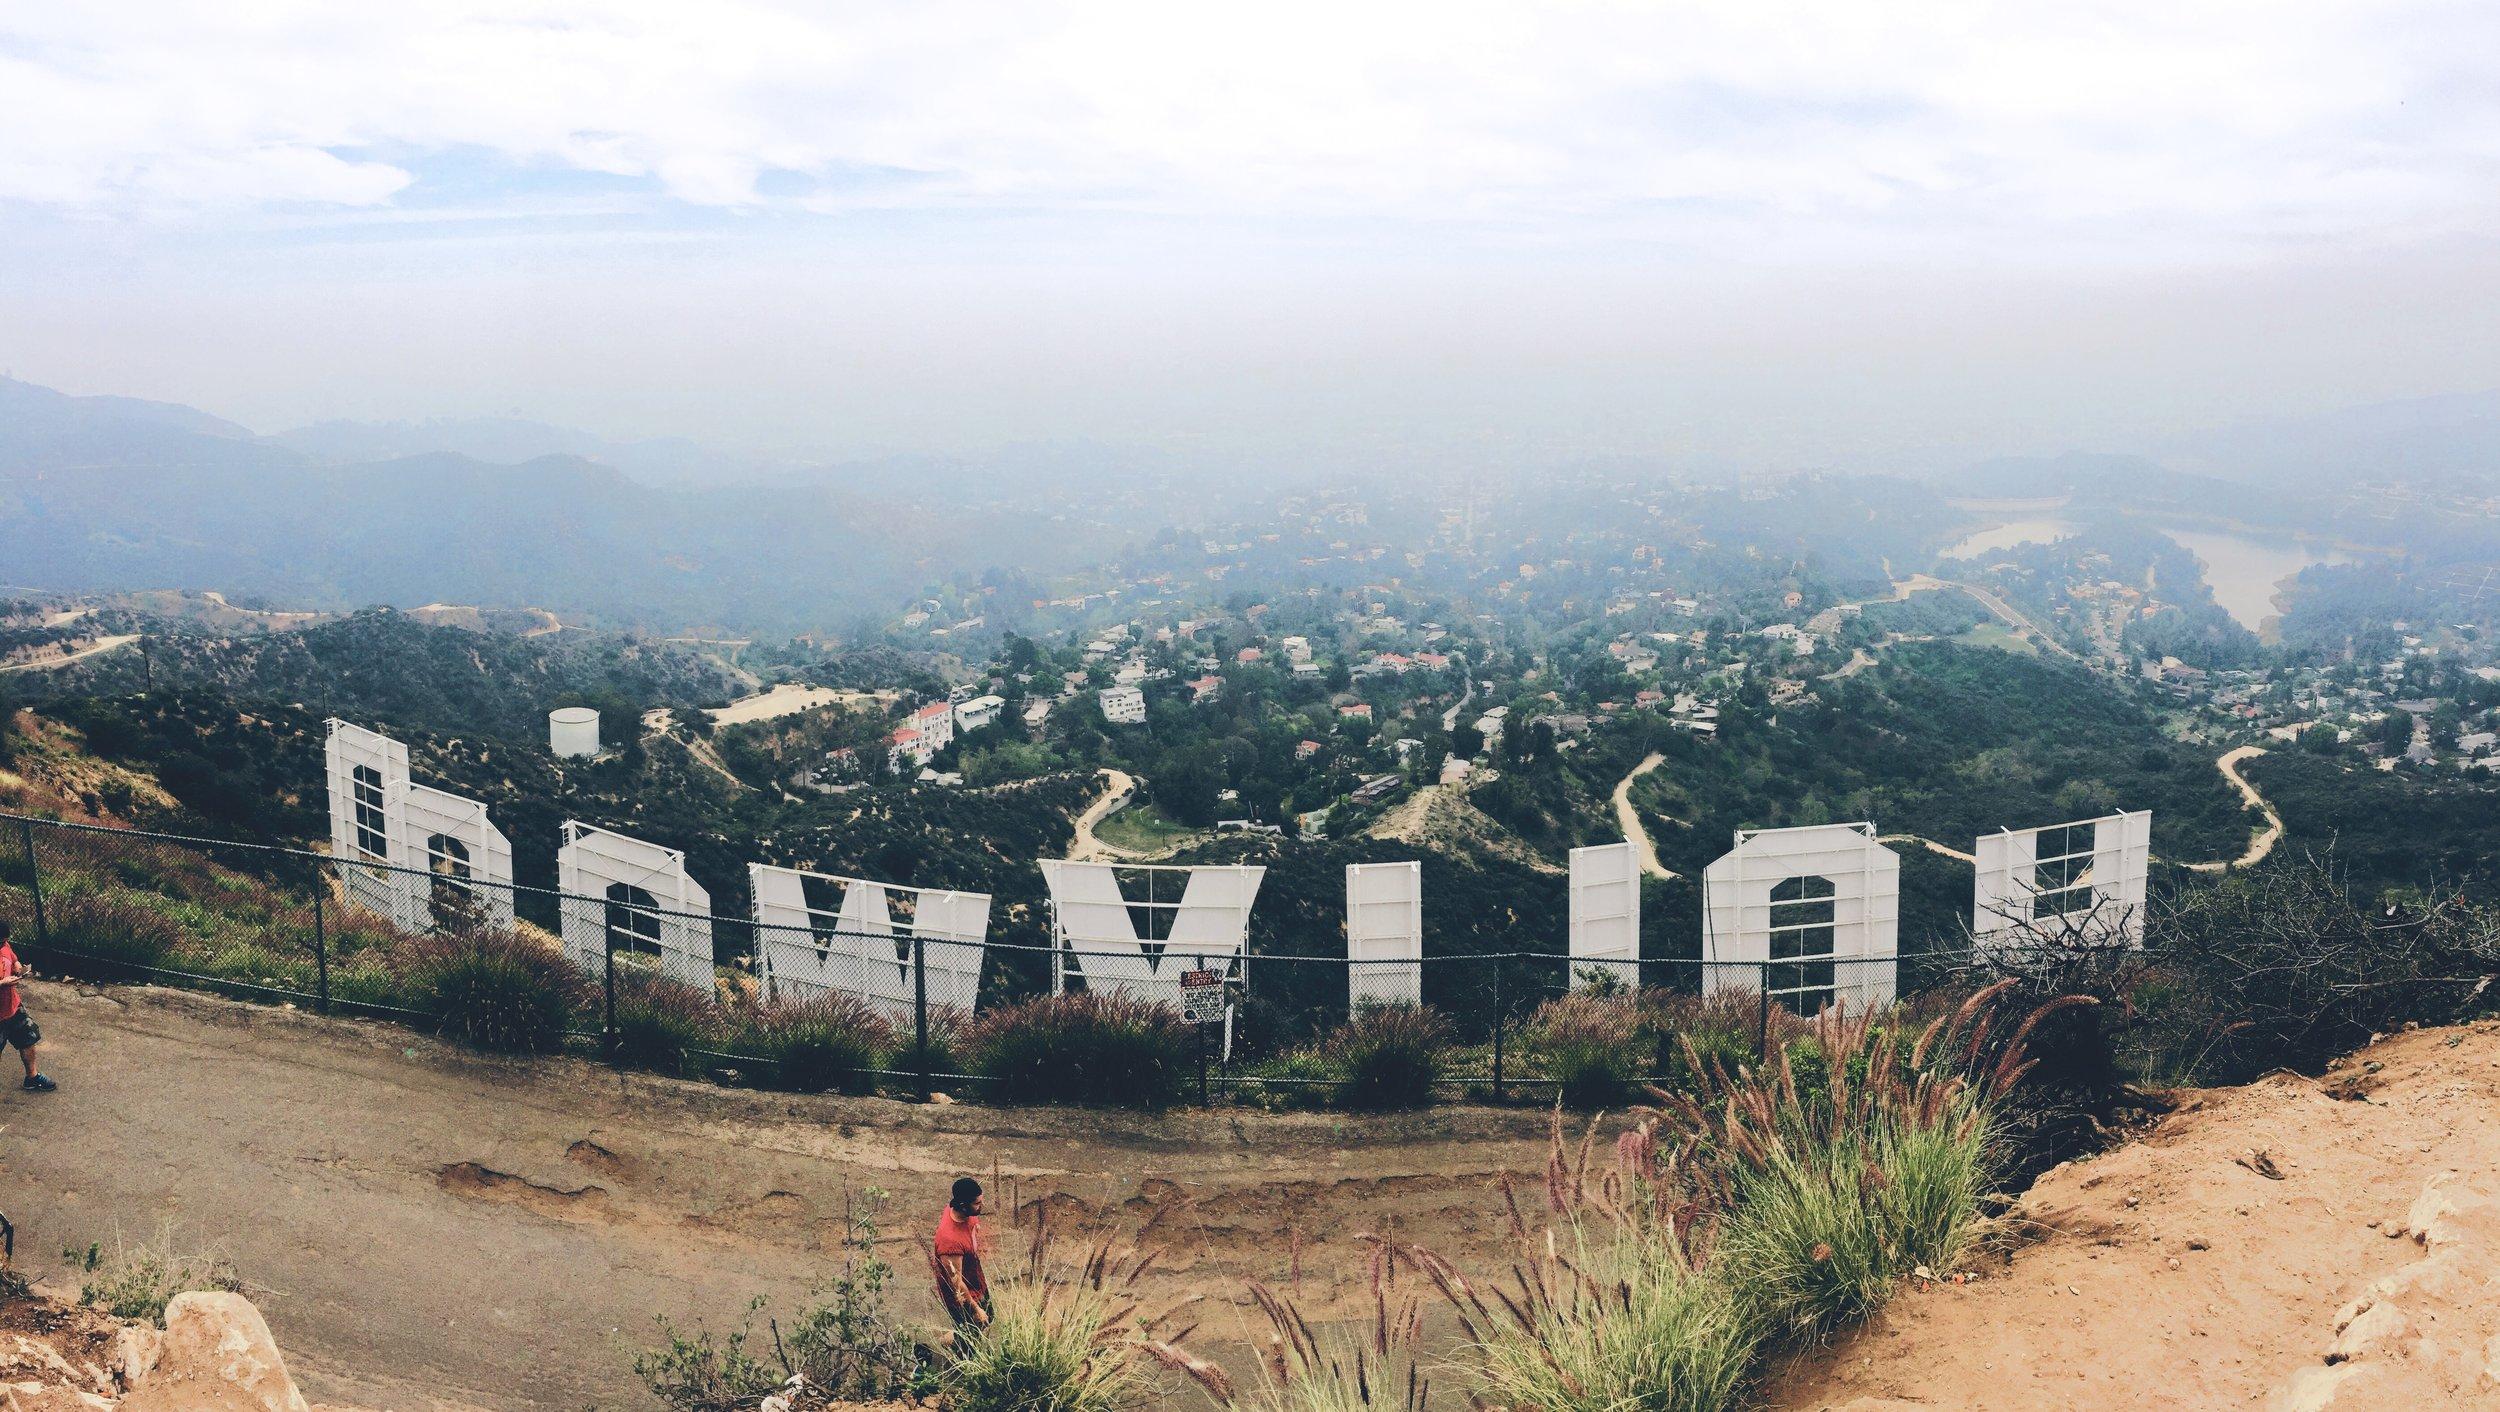 hollywood sign.jpeg